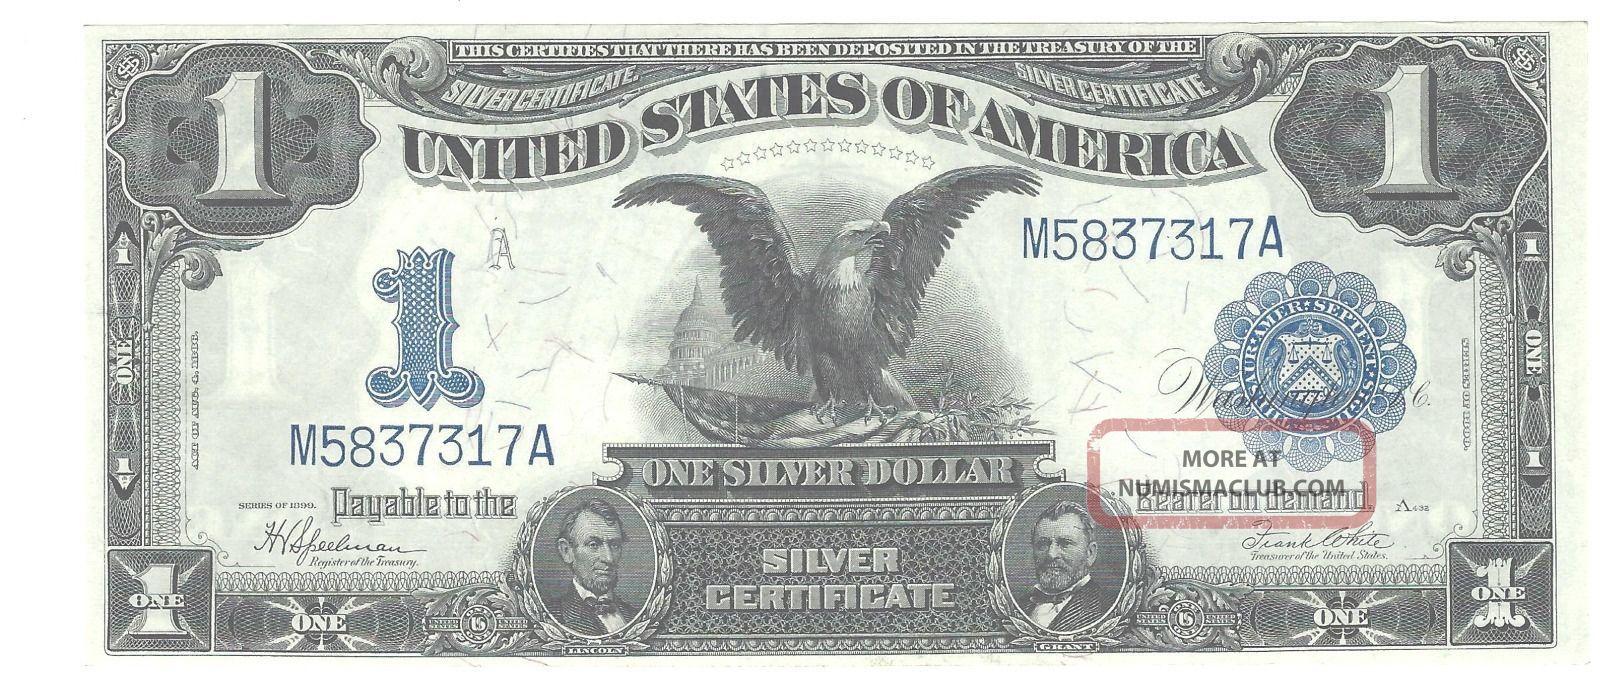 1899 Fr - 236 $1 Silver Certificate,  Gem Crisp Uncirculated Large Size Notes photo